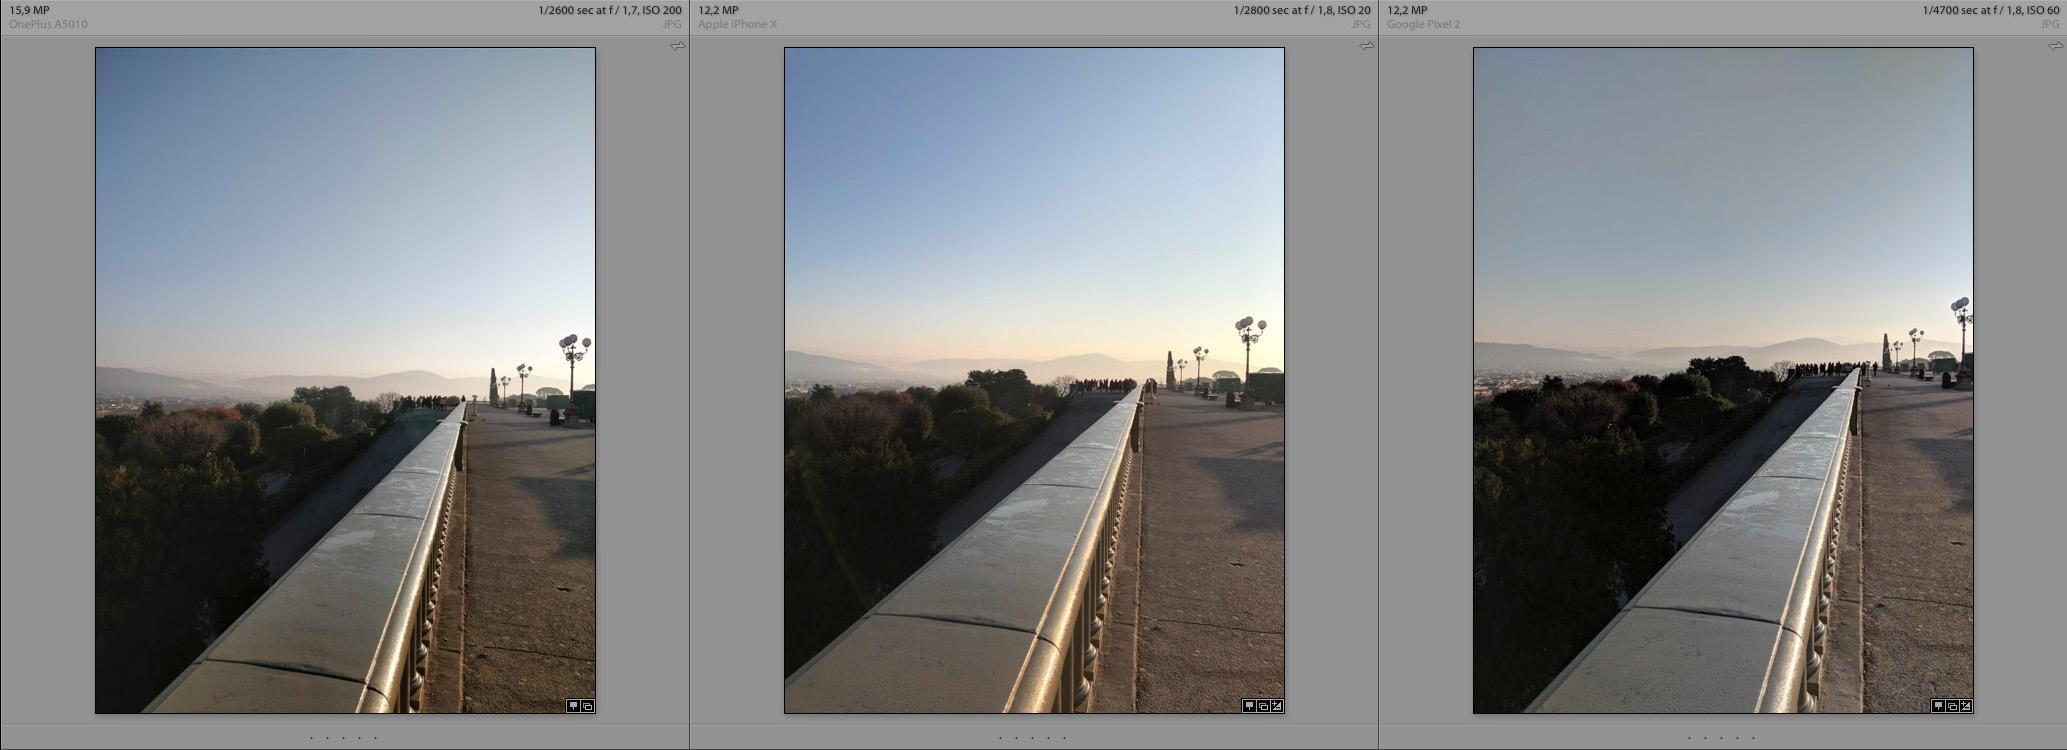 OnePlus 5t vs iPhoneX vs Google Pixel 2 Daylight Photography